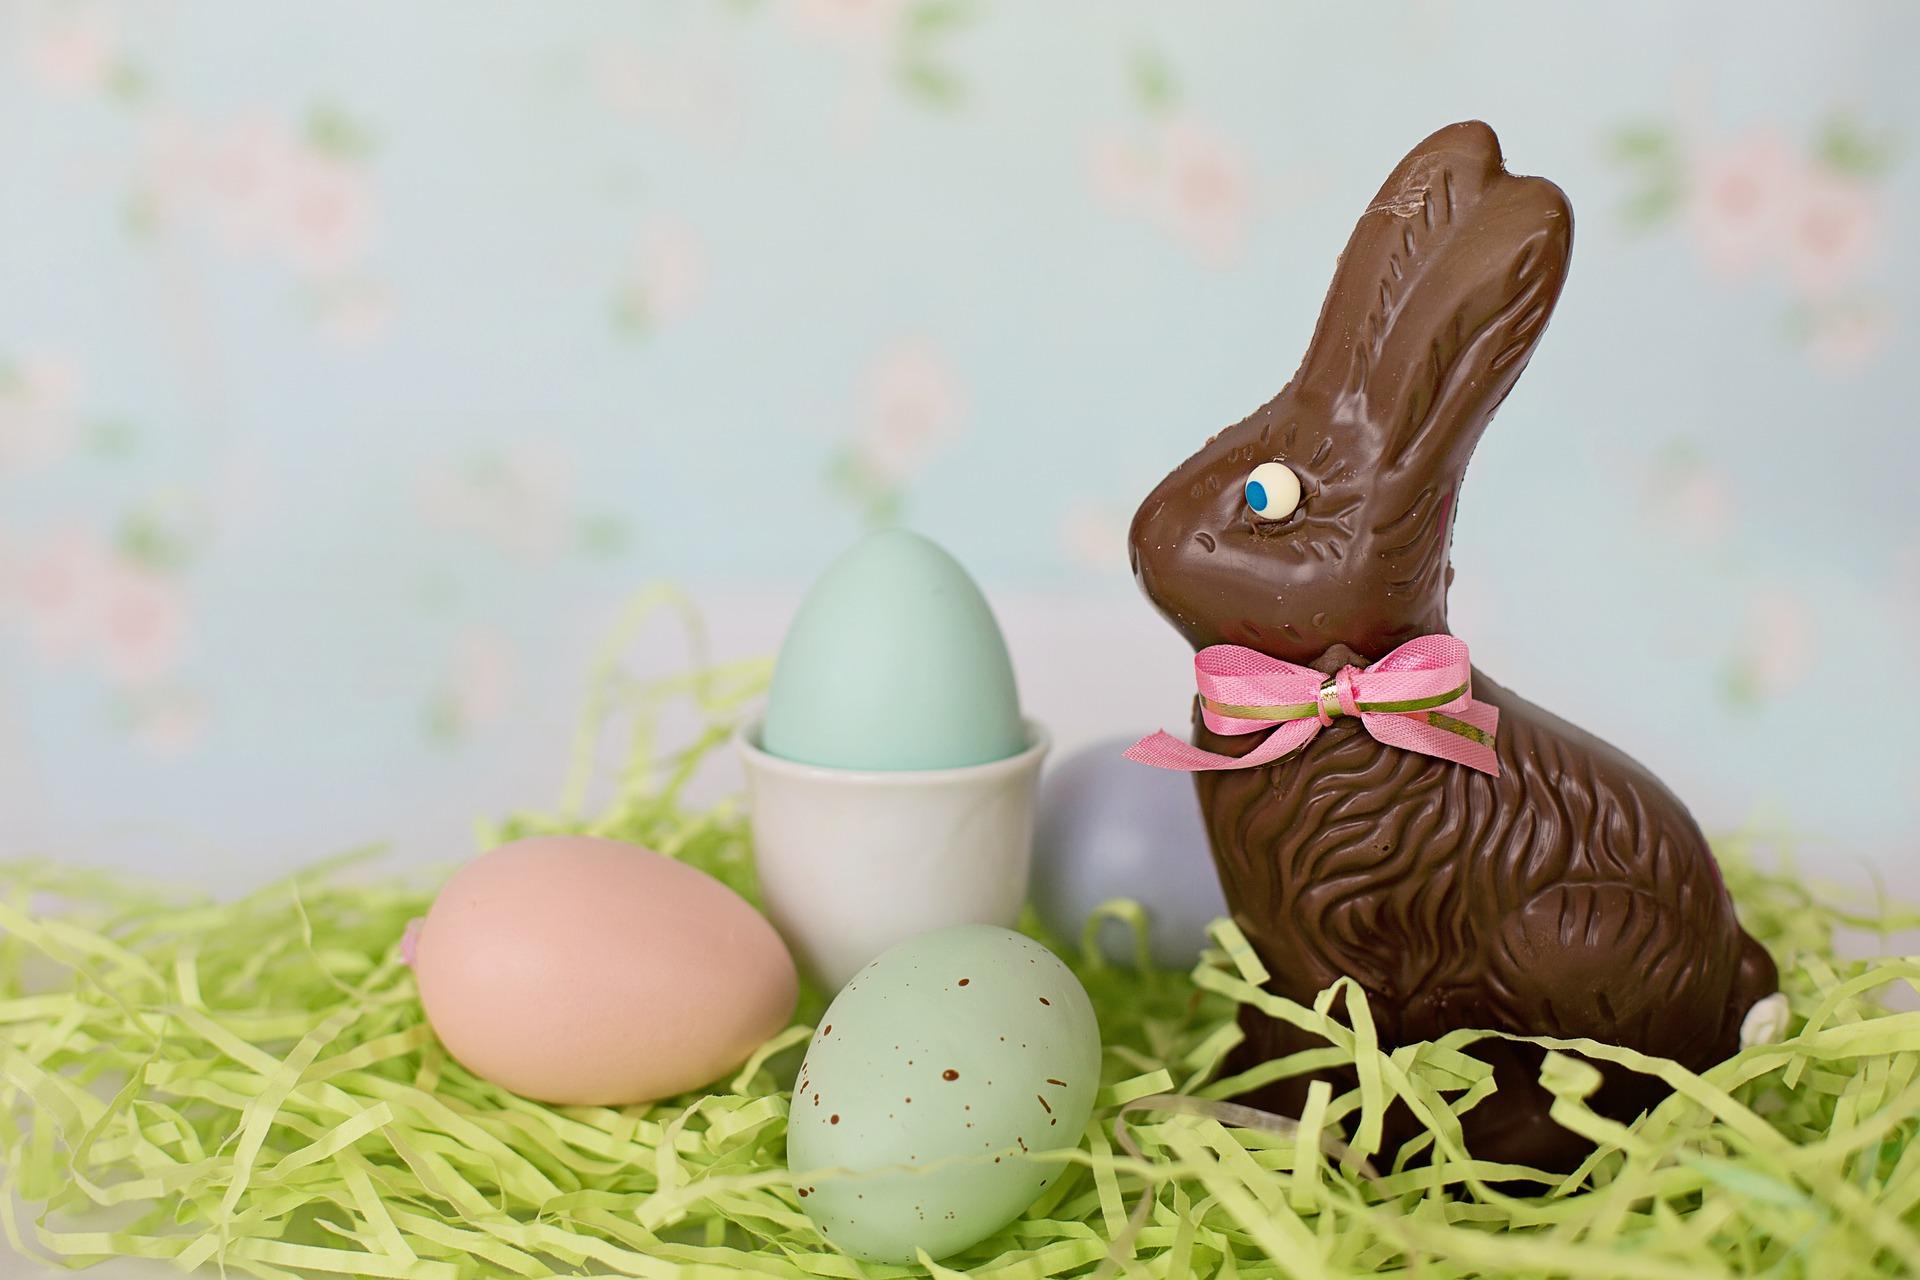 chocolate-bunny-4988644_1920